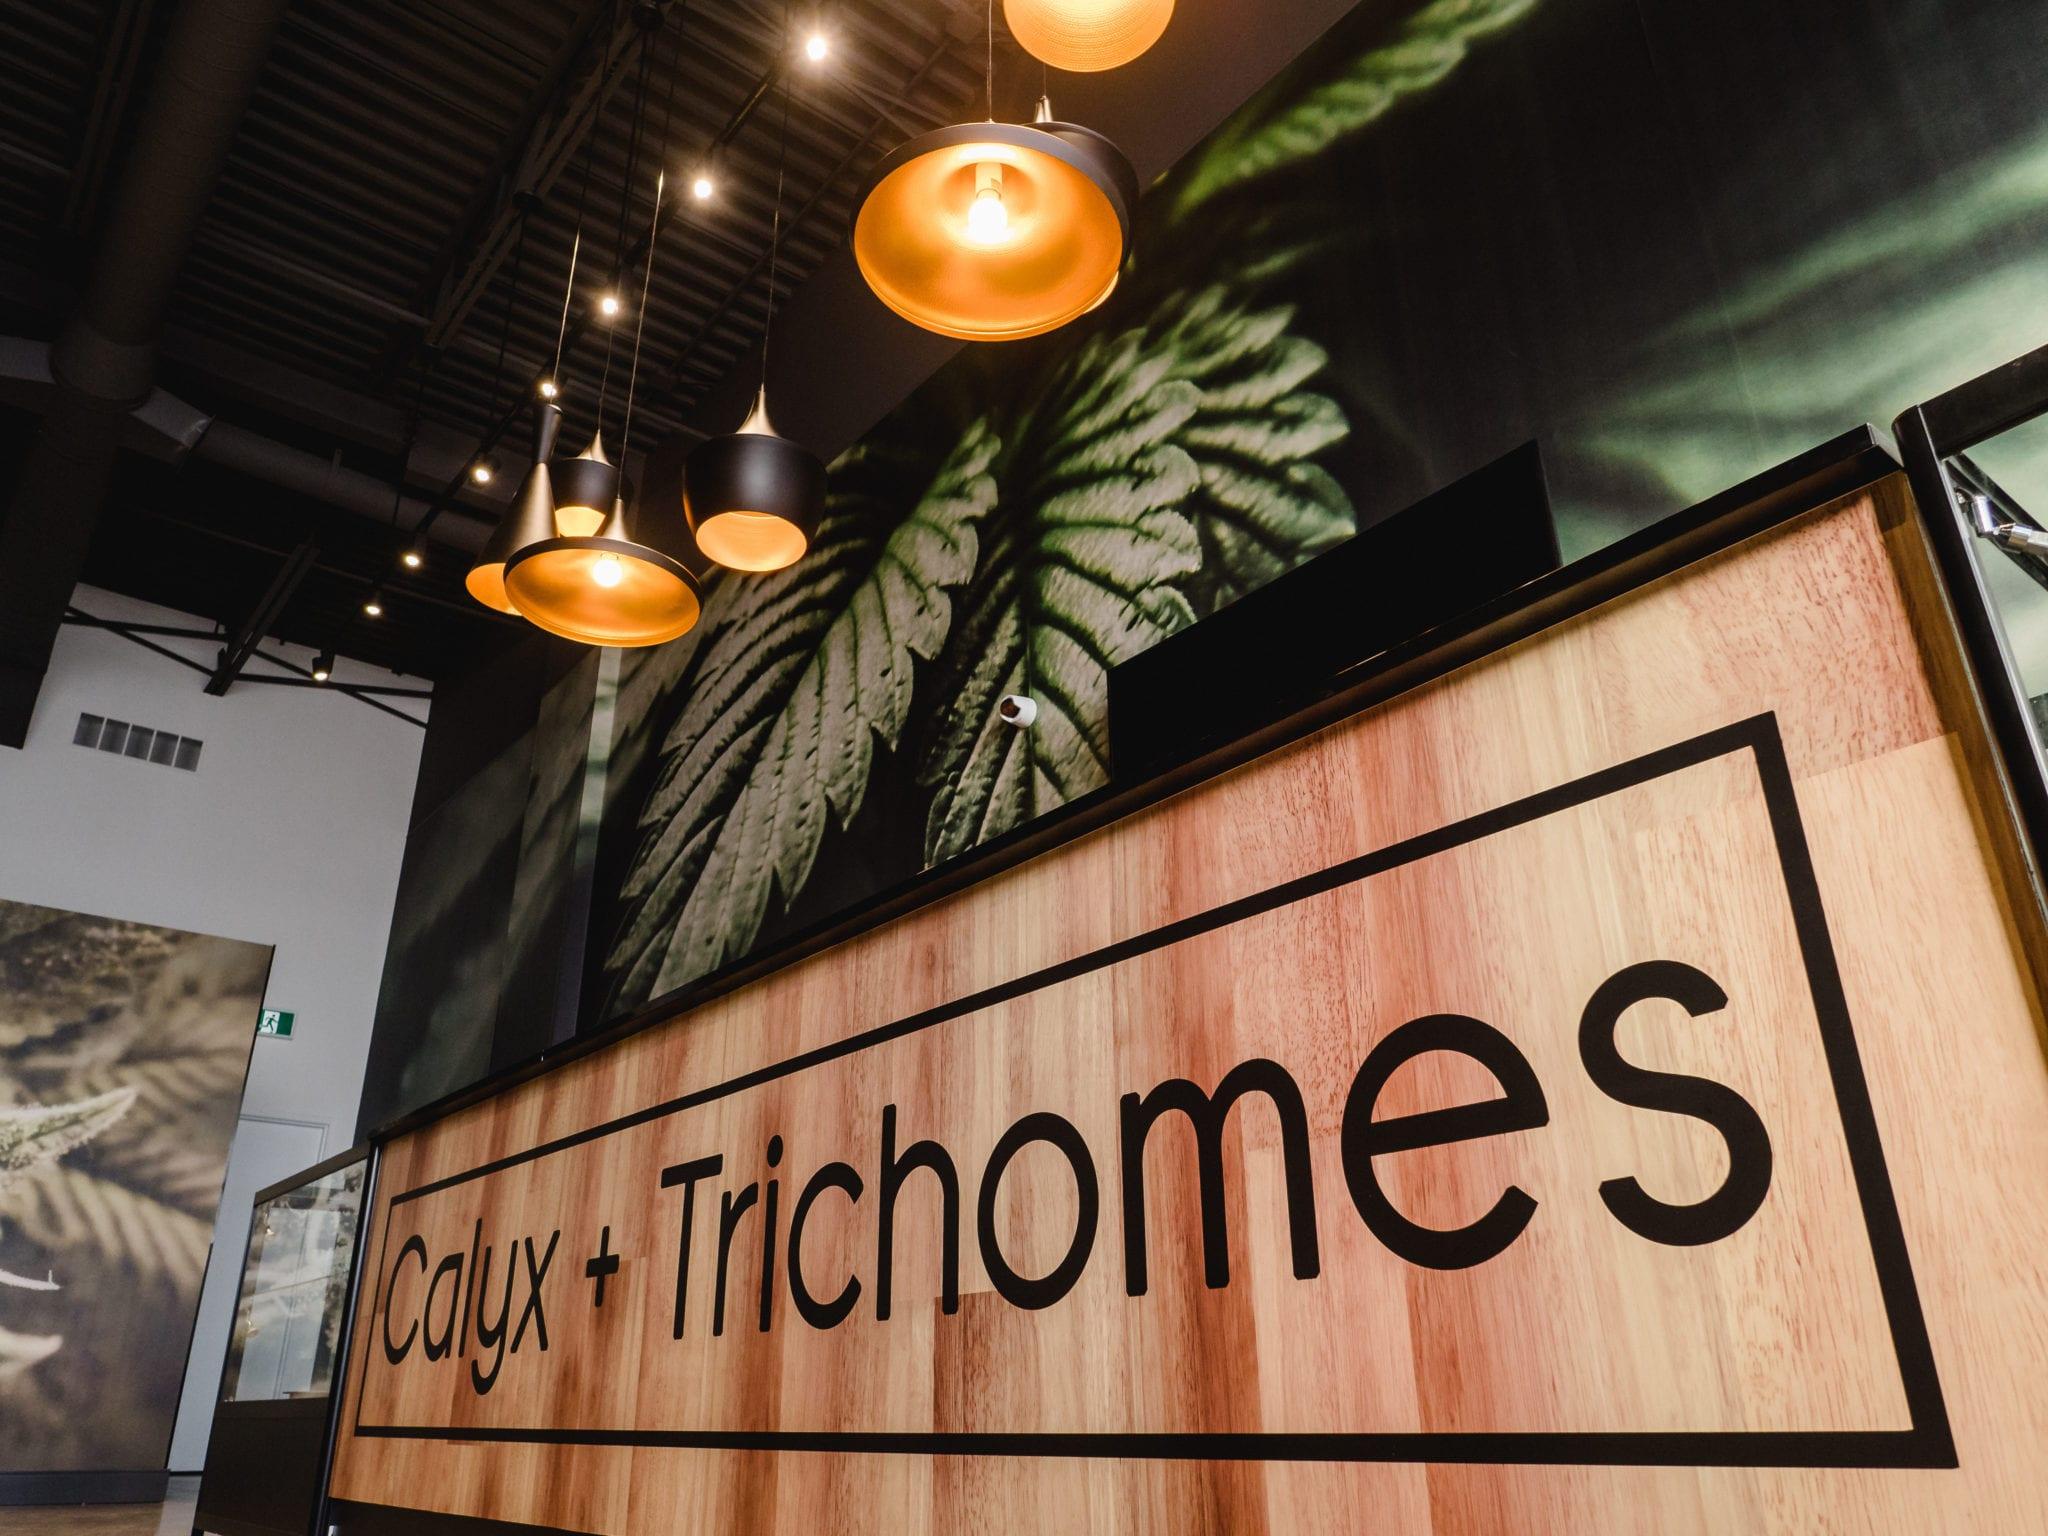 logo writing at Calyx + Trichomes